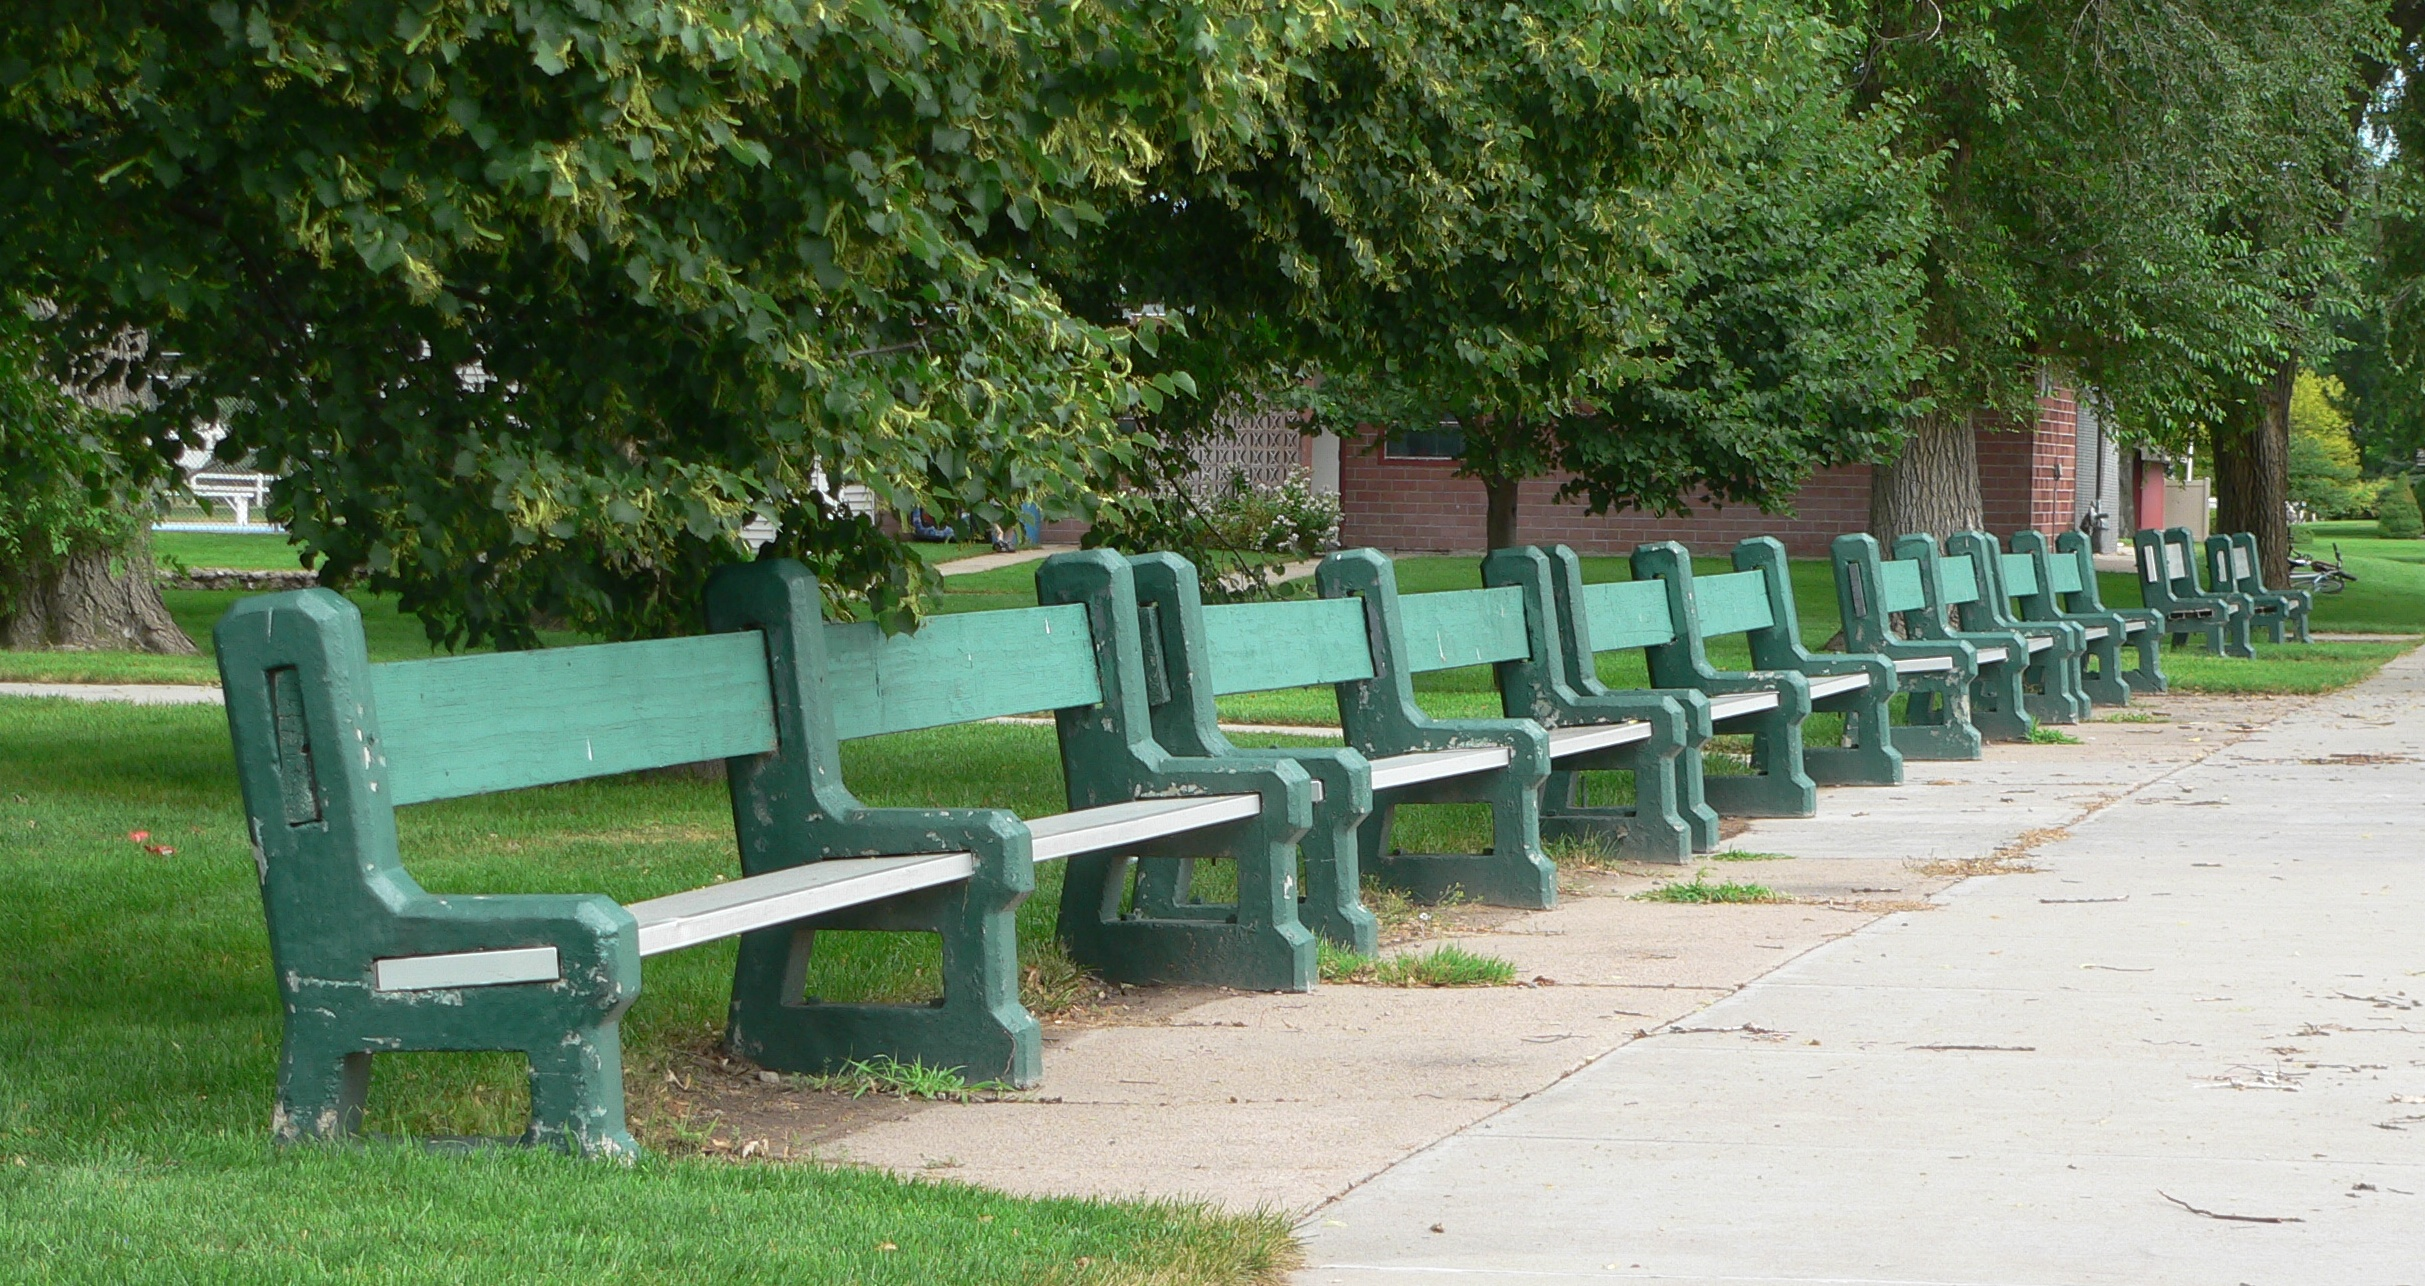 File:Grant, Nebraska city park benches 1.JPG - Wikimedia Commons